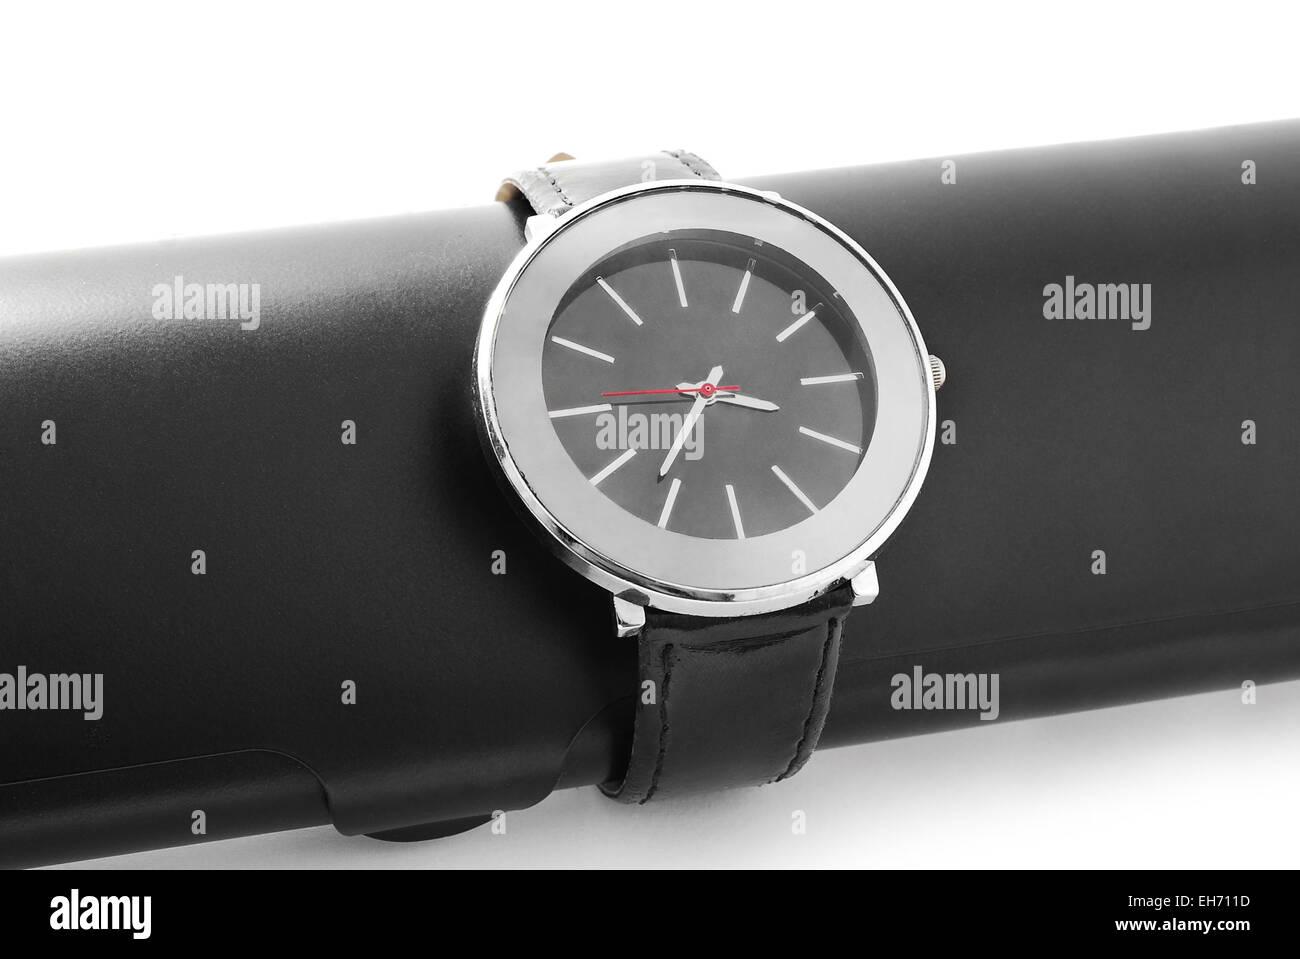 wrist watch on white background - Stock Image